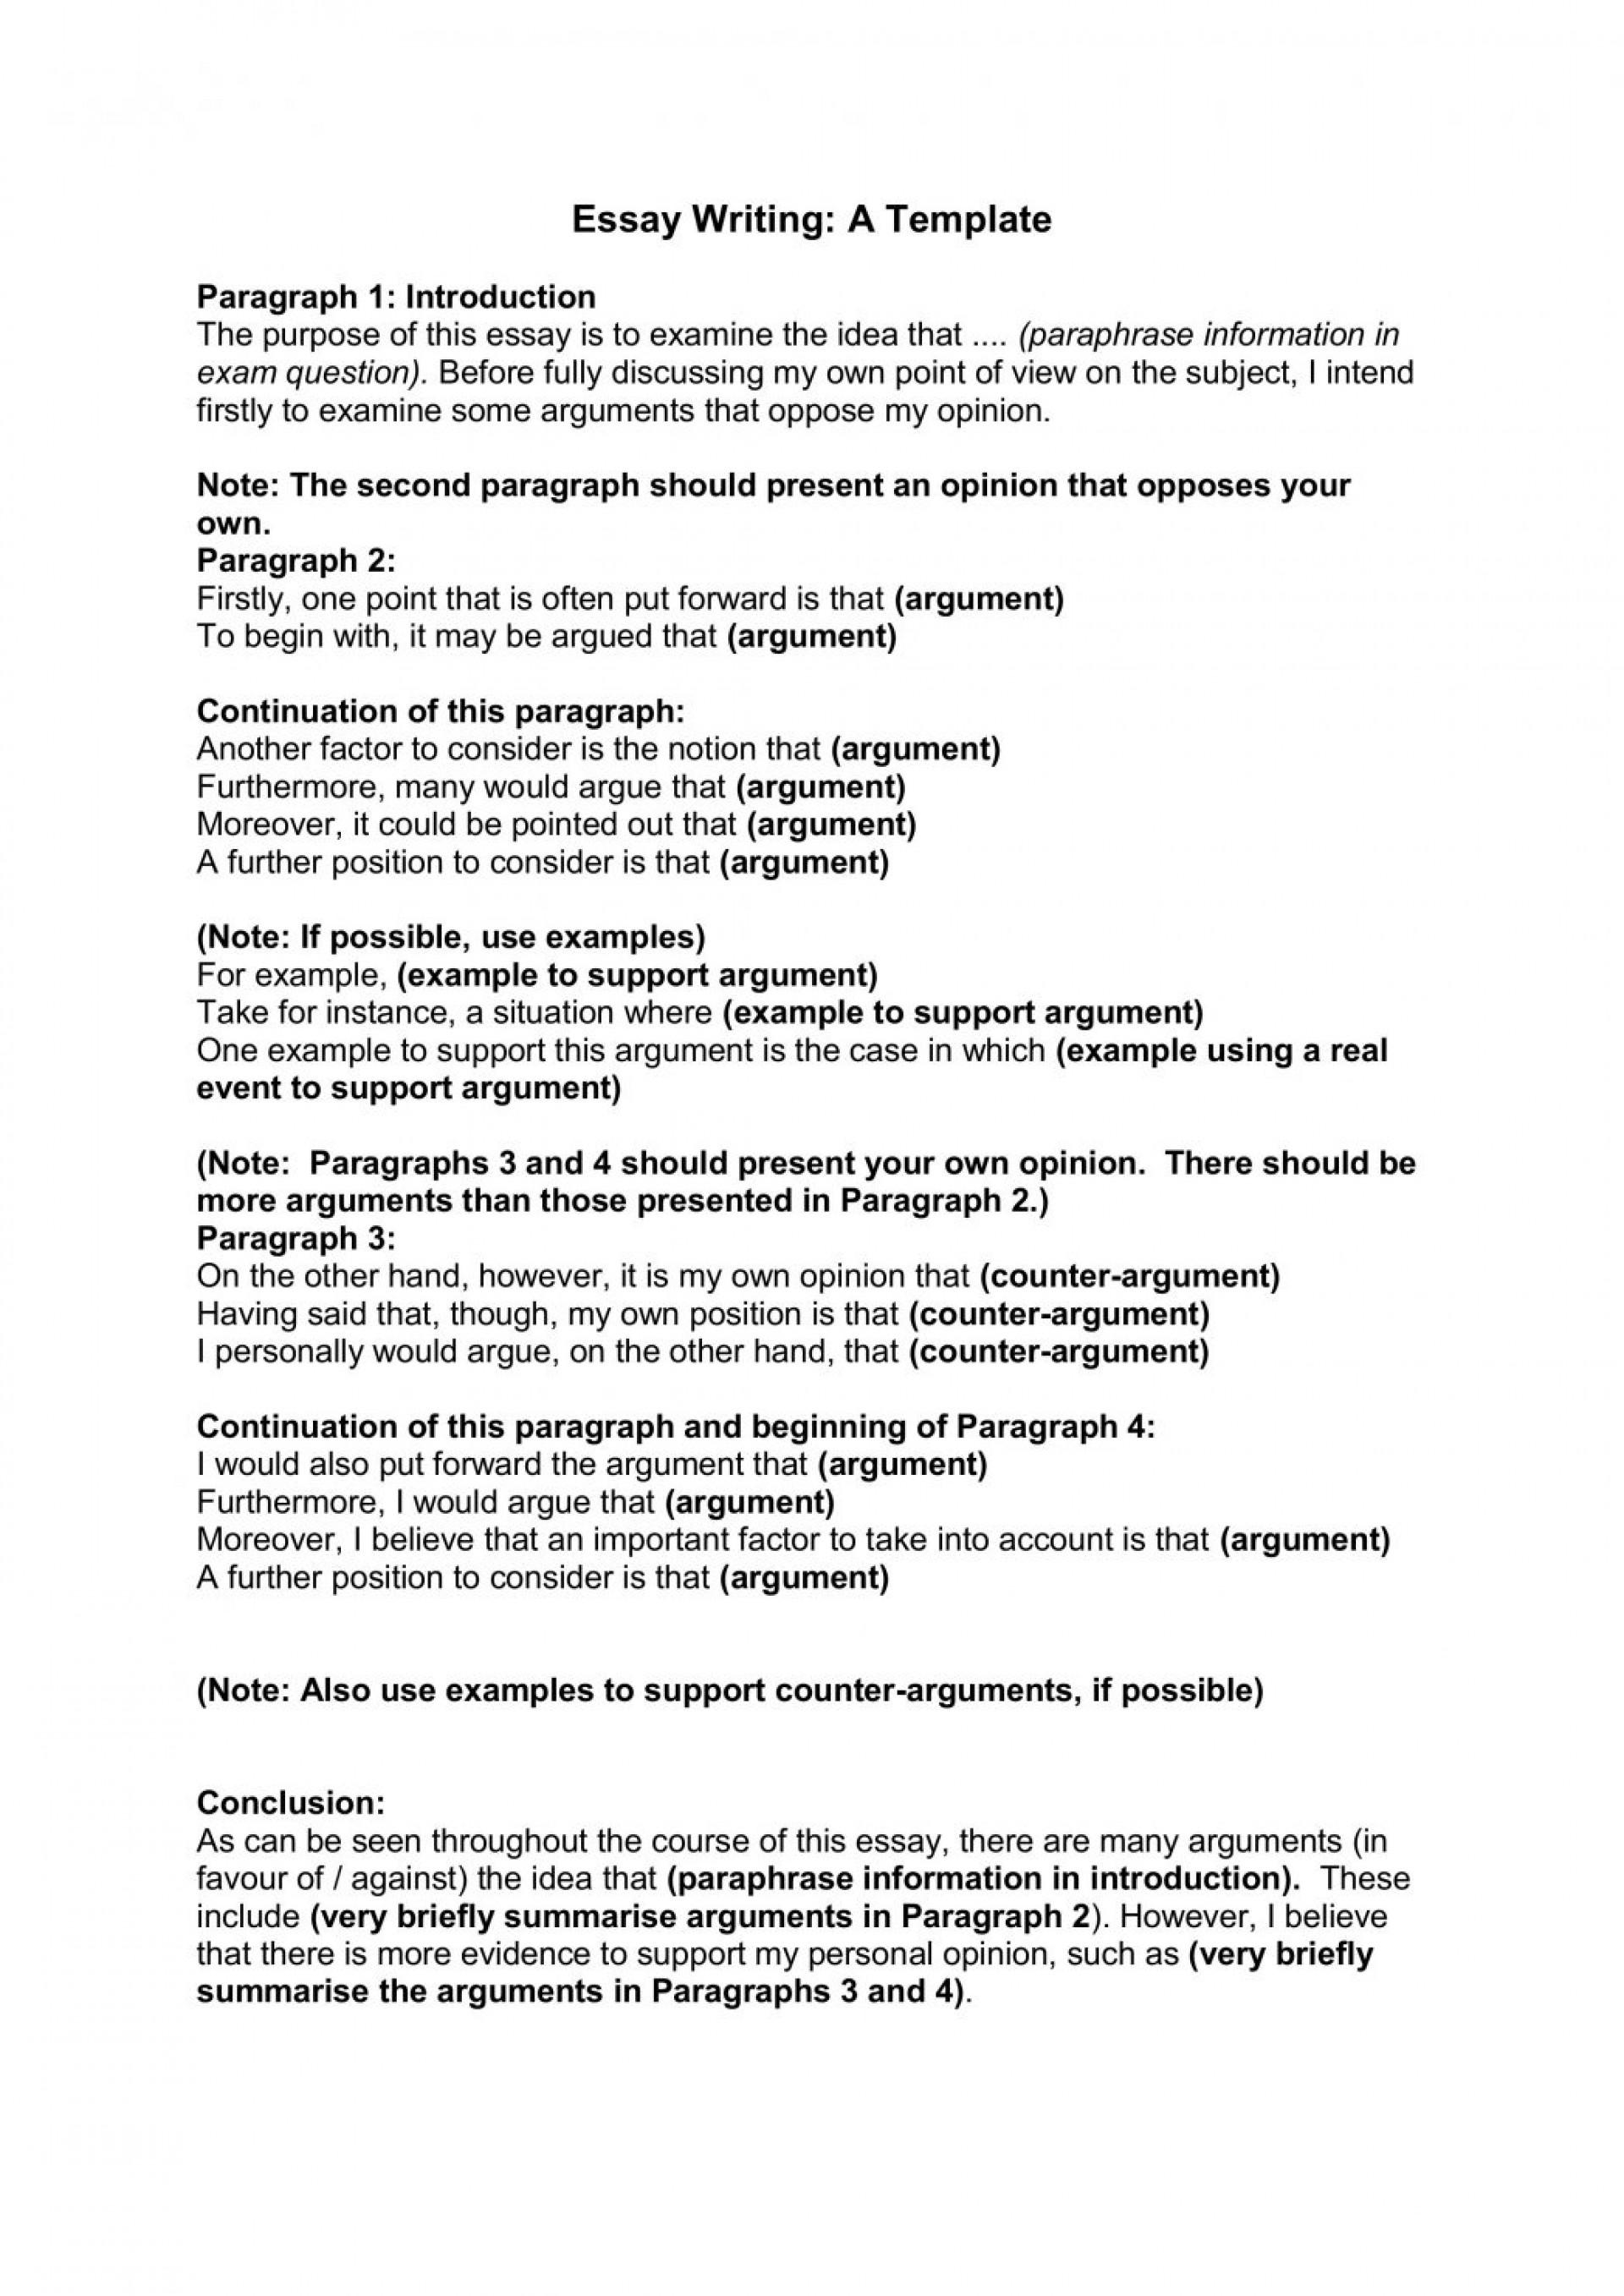 013 Argumentative Essay Hook Examples Example Toefl Samples Academic Good Hooks Writing Template For P Incredible Pdf 1920